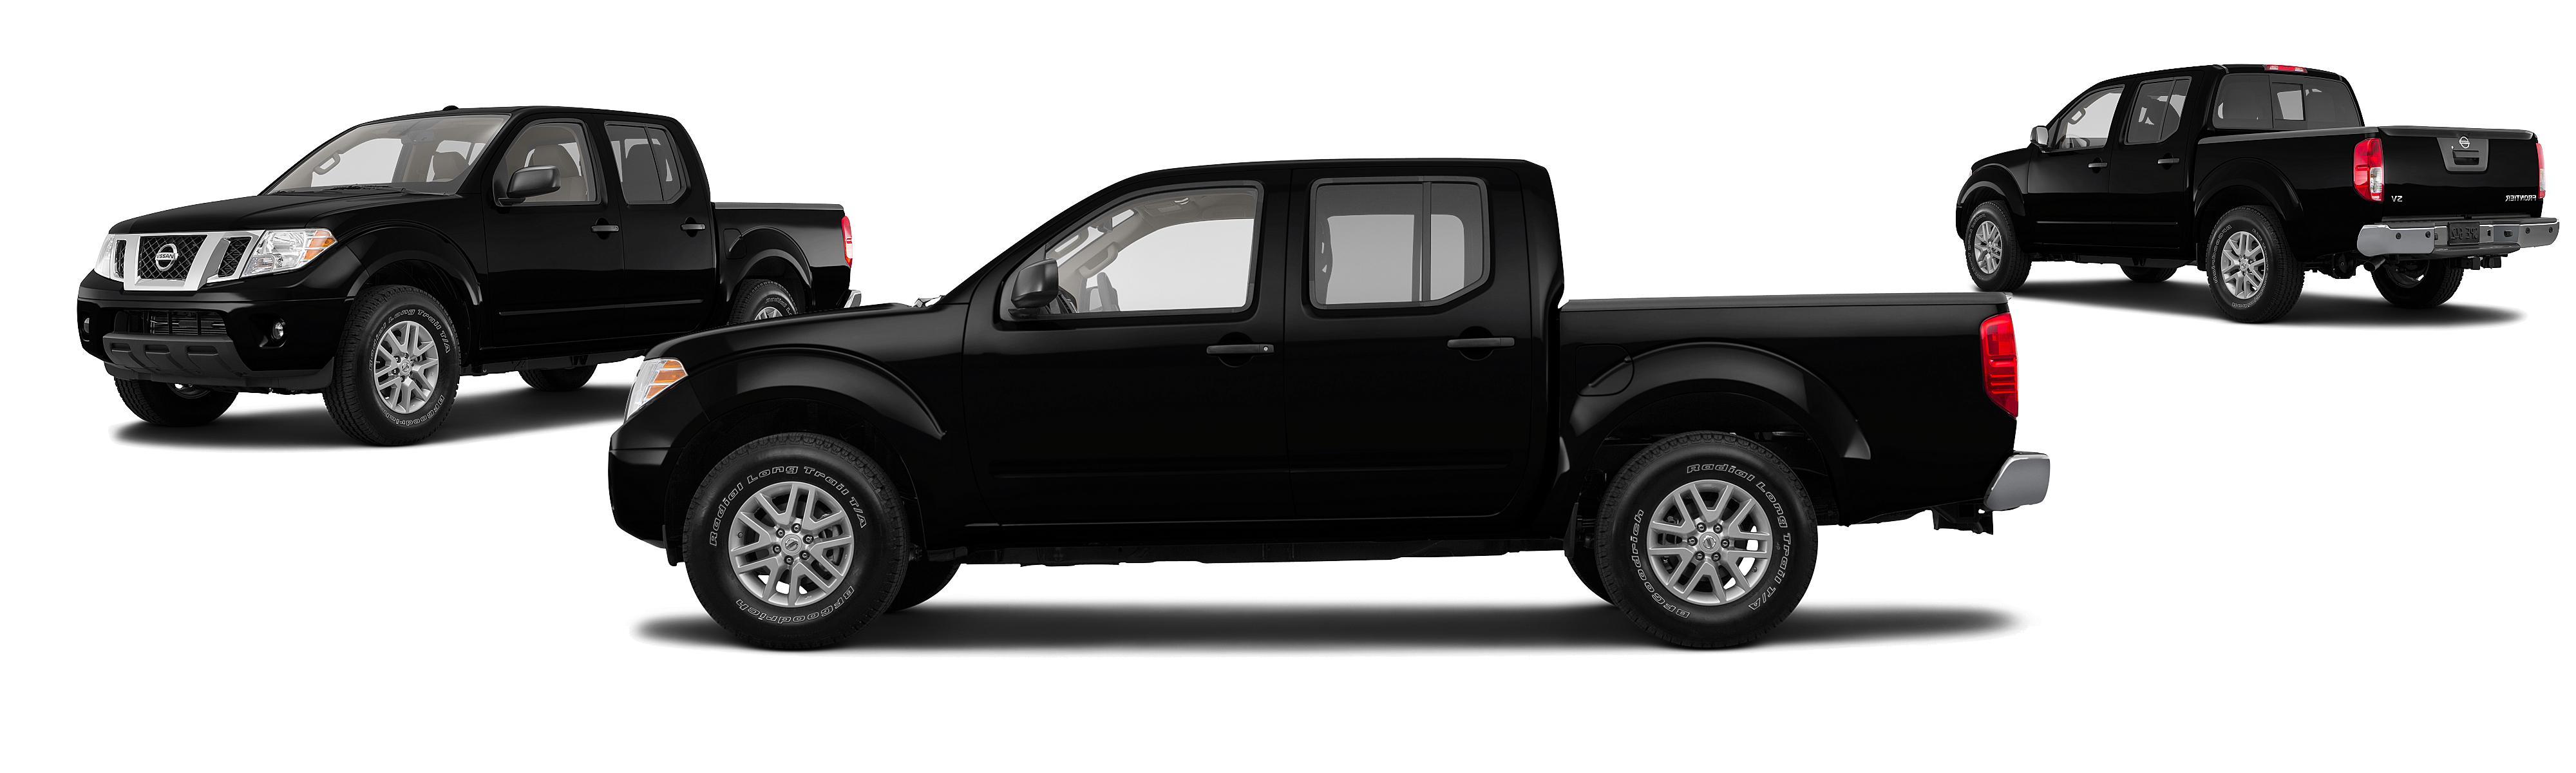 floor mats walmart duty mid nissan set com piece ip truck go heavy frontier black gear mat rubber